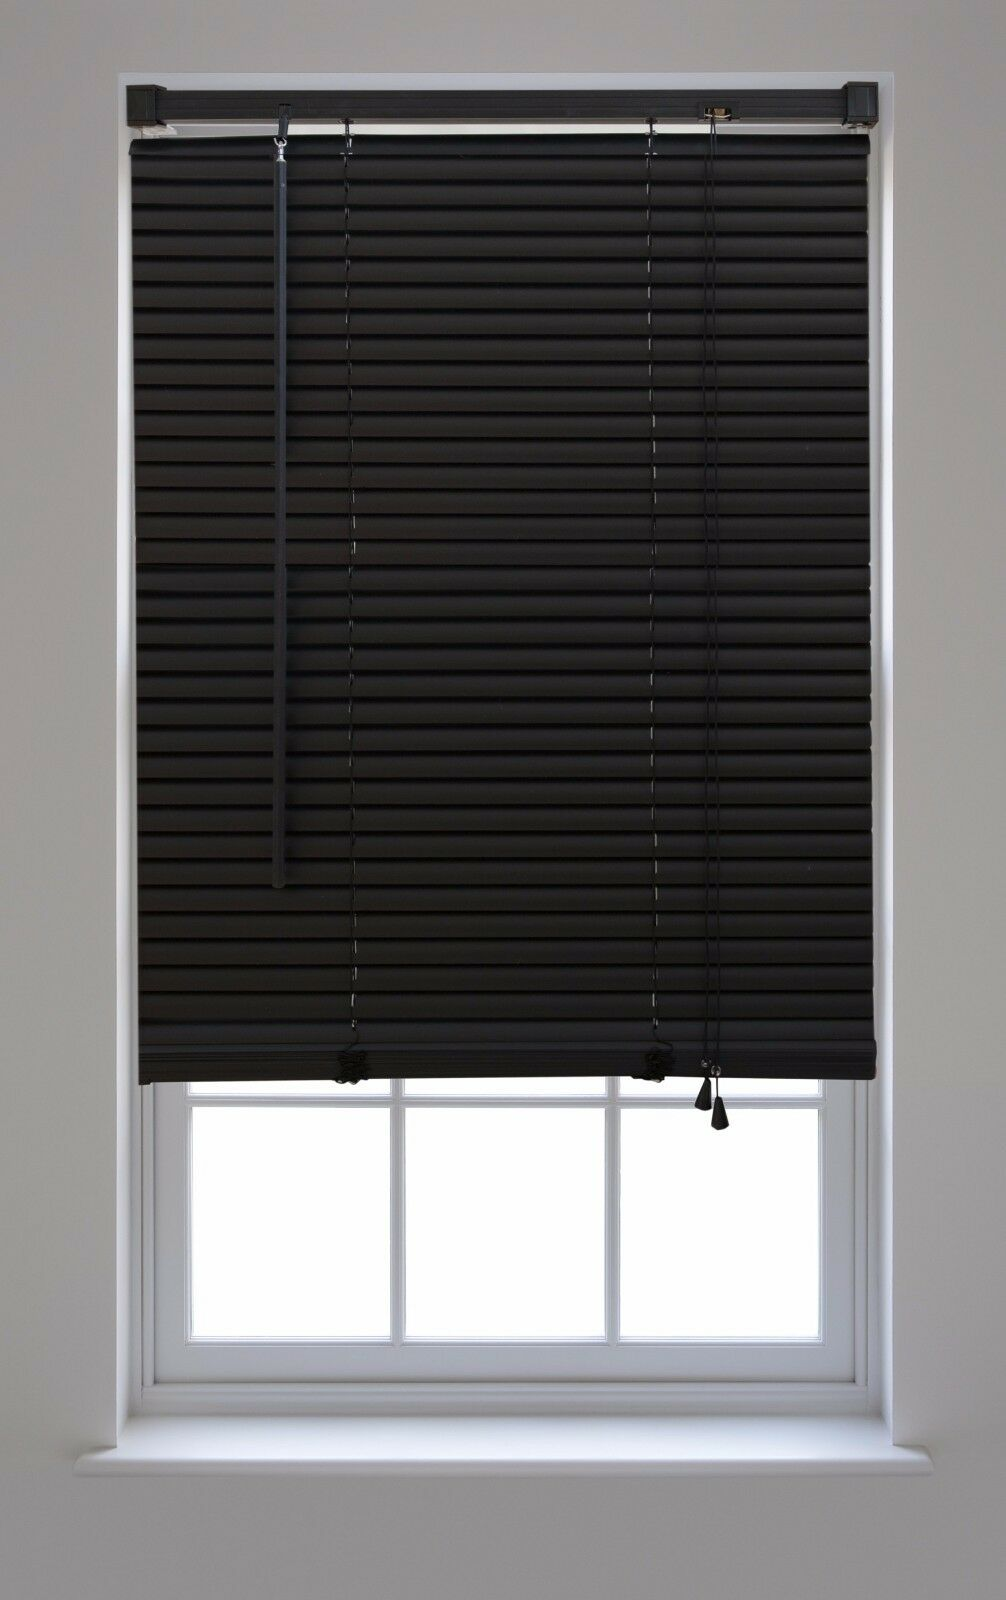 Black Window Blind Venetian Cover Shade PVC Curtain Sun Shutter Screen 27 Sizes